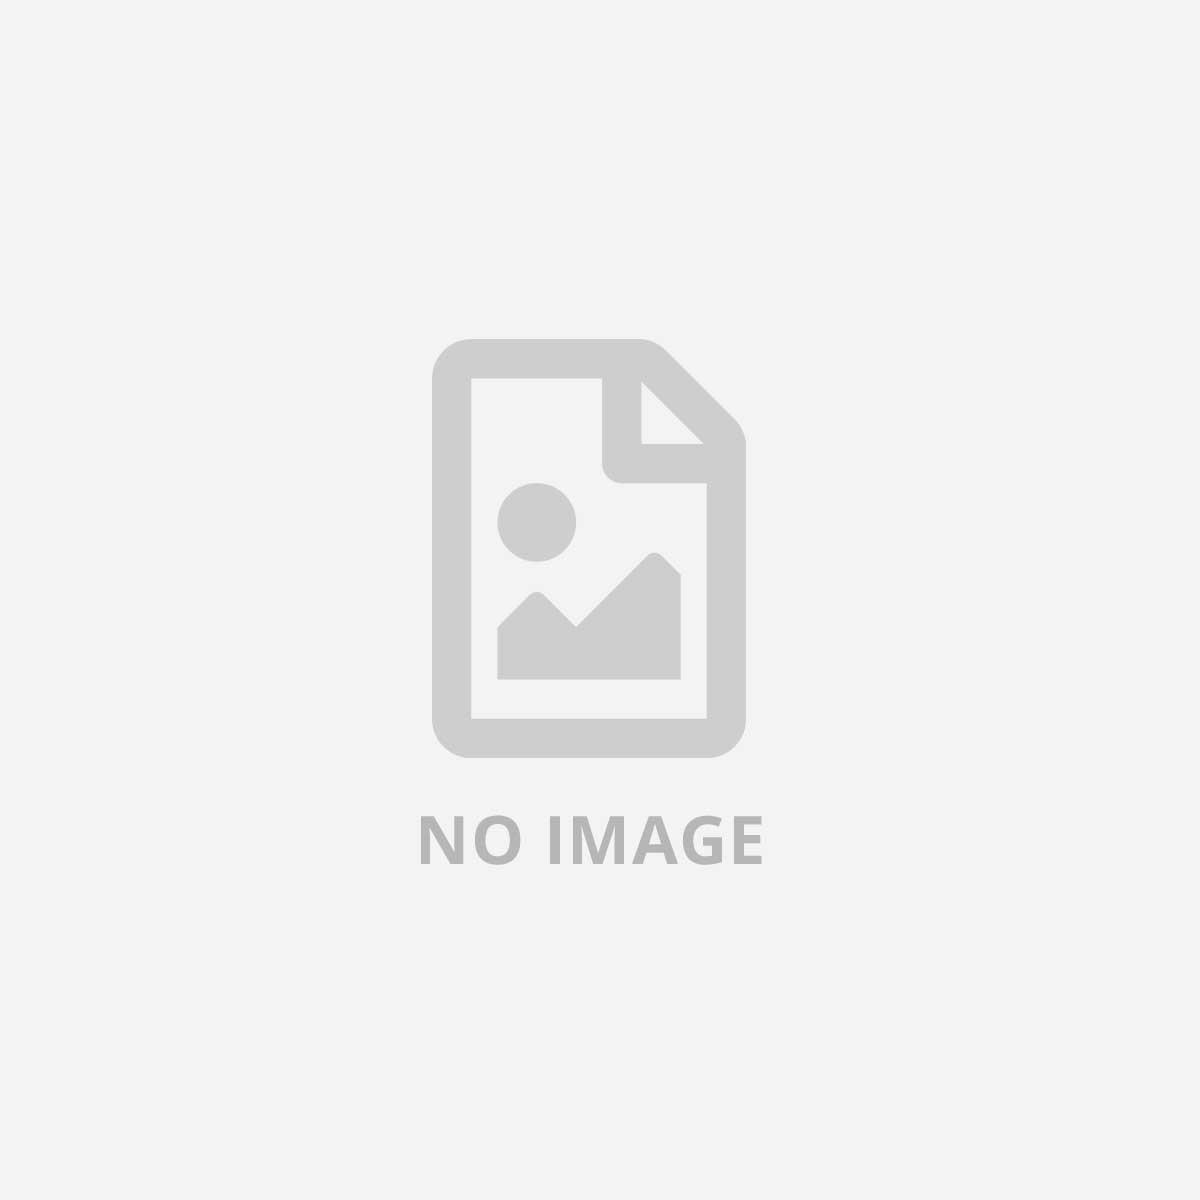 HP Z VR BP G2 I7-8850H